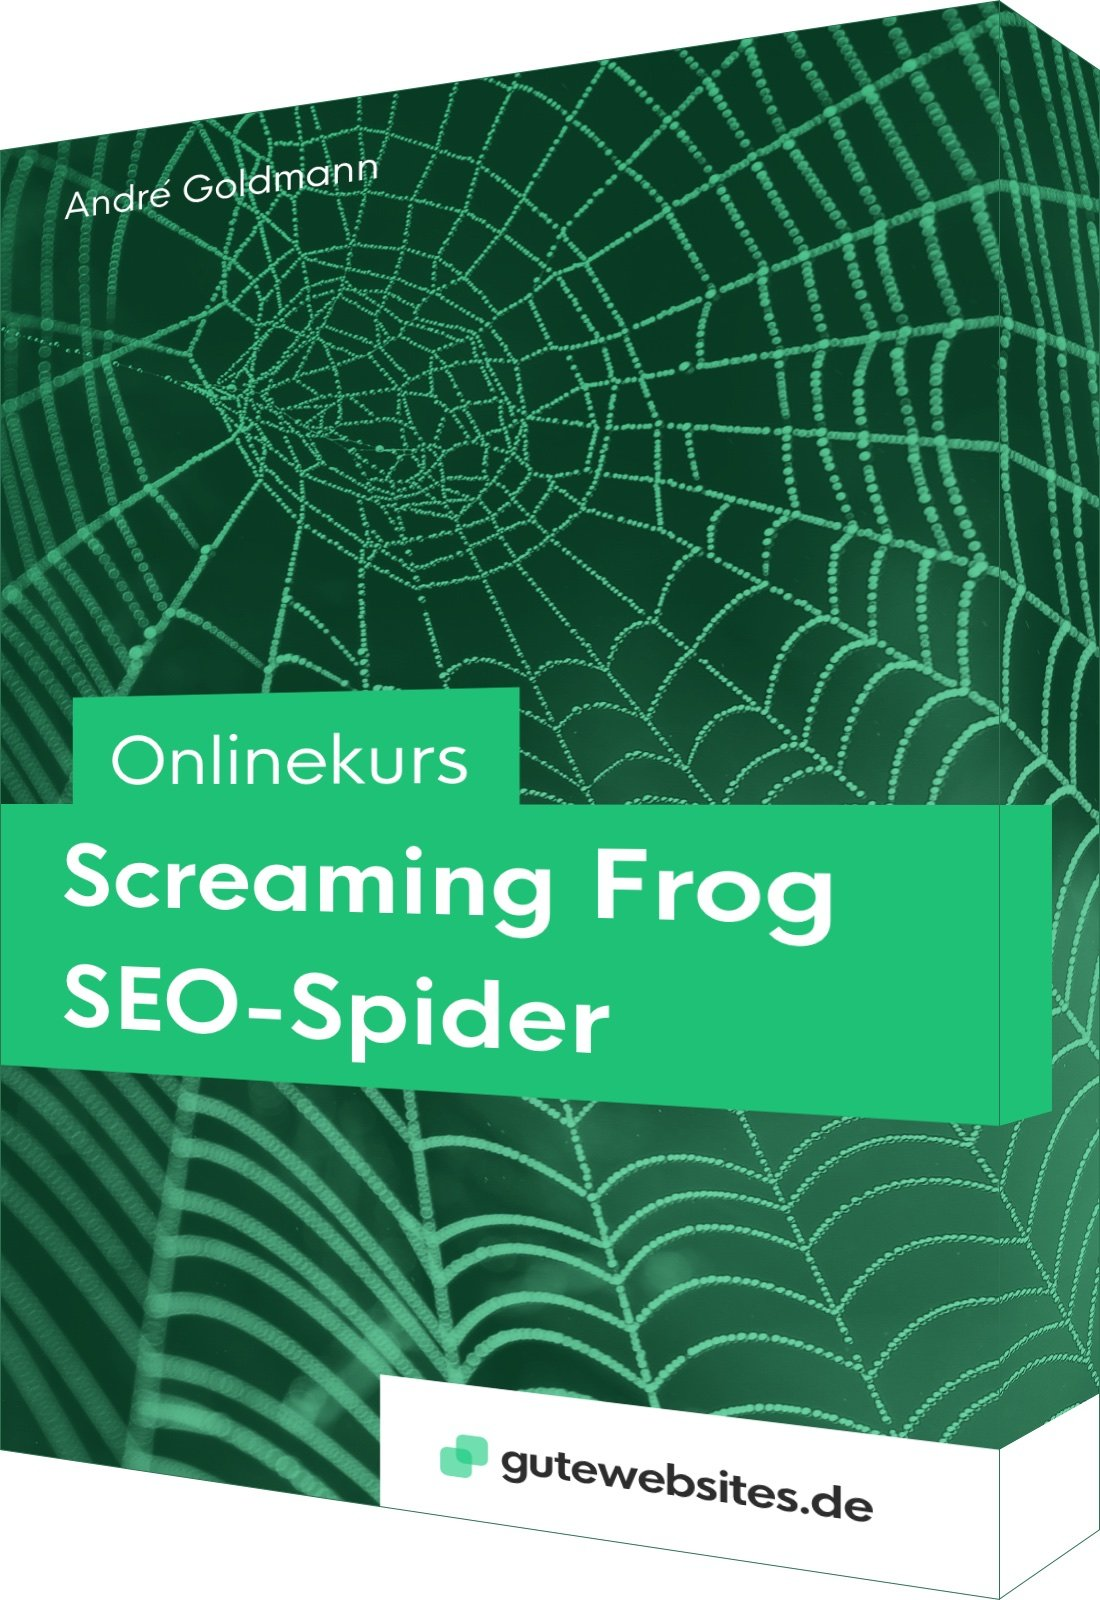 screaming-frog-seo-spider-onlinekurs